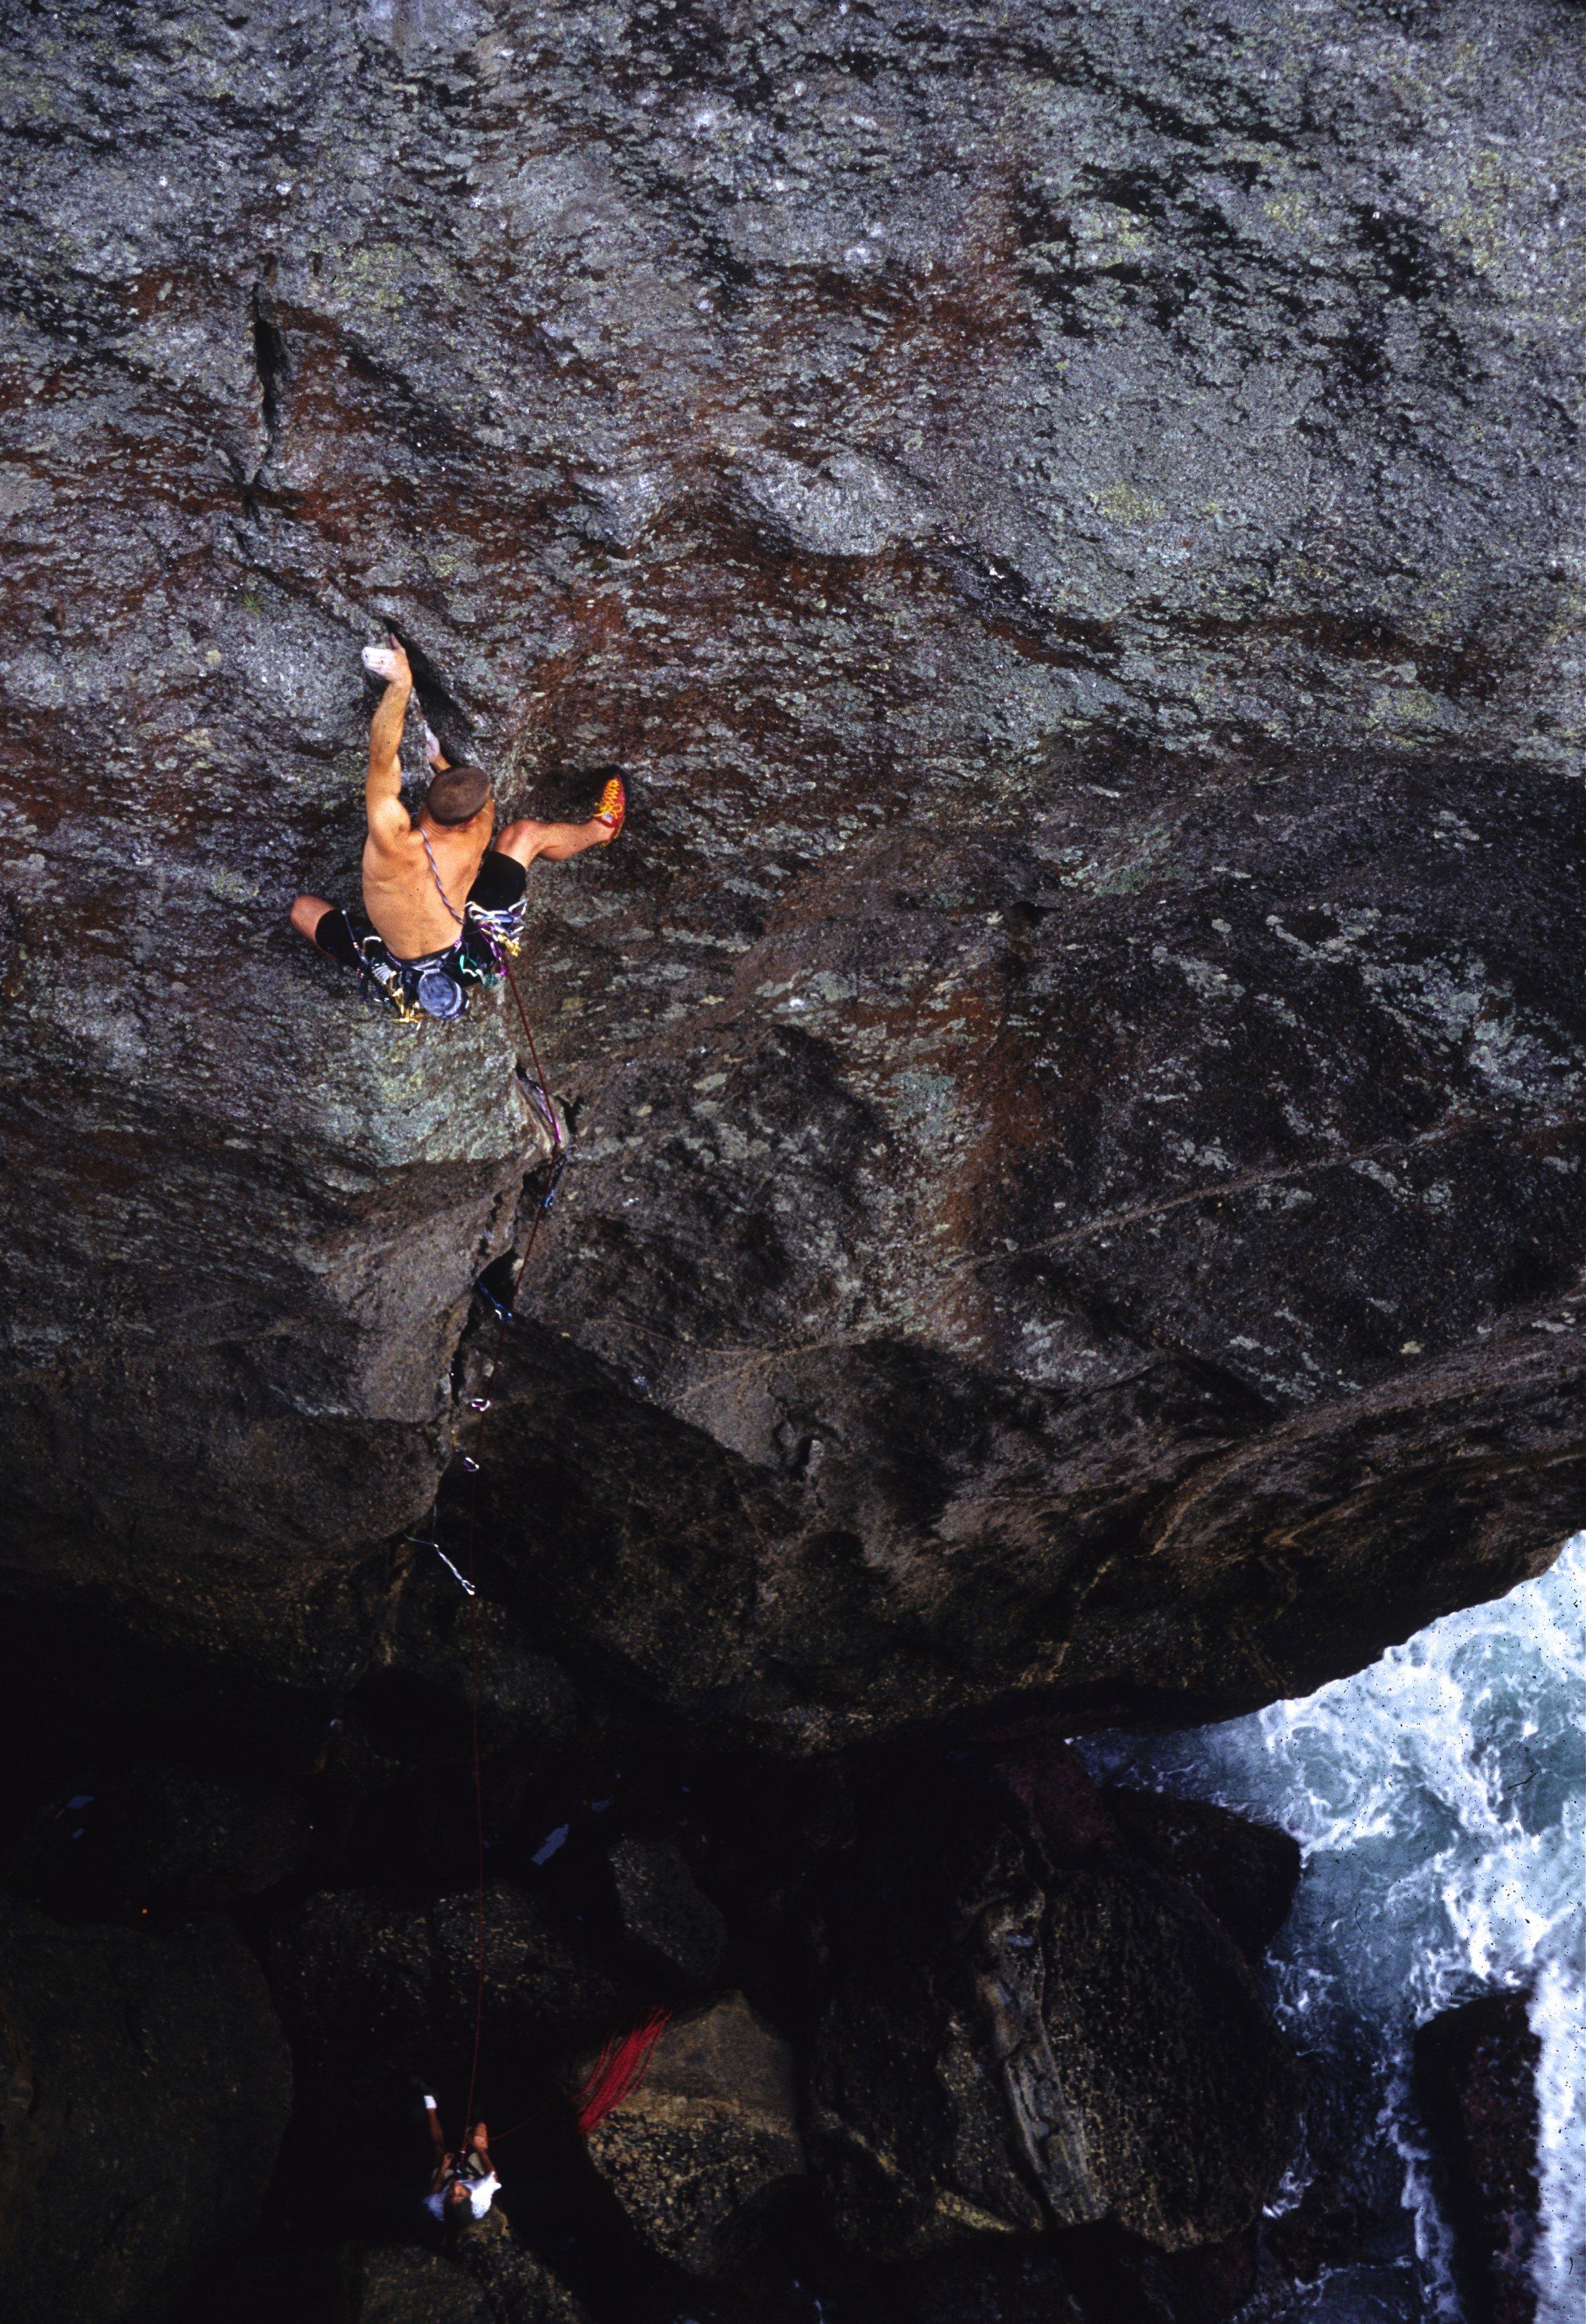 Kryptonite E7 6b, Itaquatiara. First ascent in 2000.  Photo: Mike Robertson